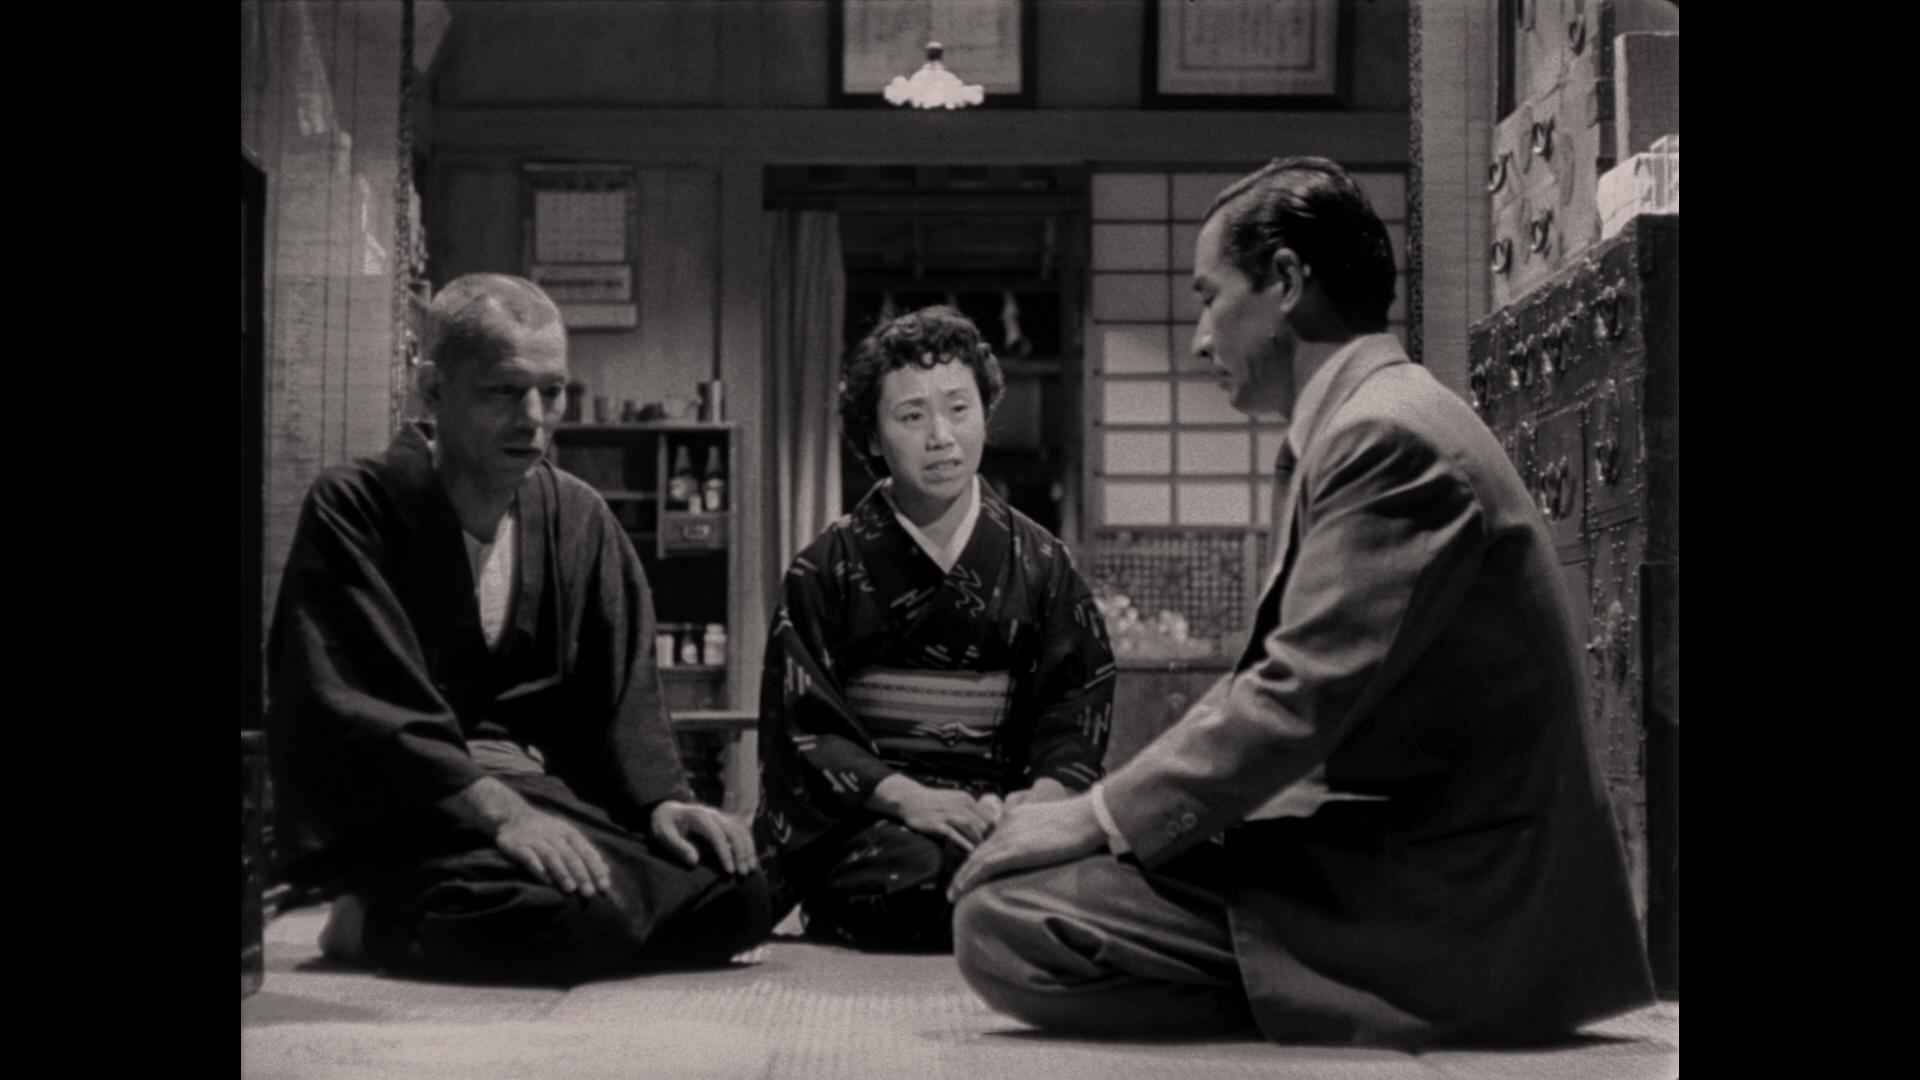 https://i2.wp.com/www.dvdbeaver.com/film4/blu-ray_reviews_59/tokyo_story_blu-ray_/large/large_tokyo_story_blu-ray_05.jpg